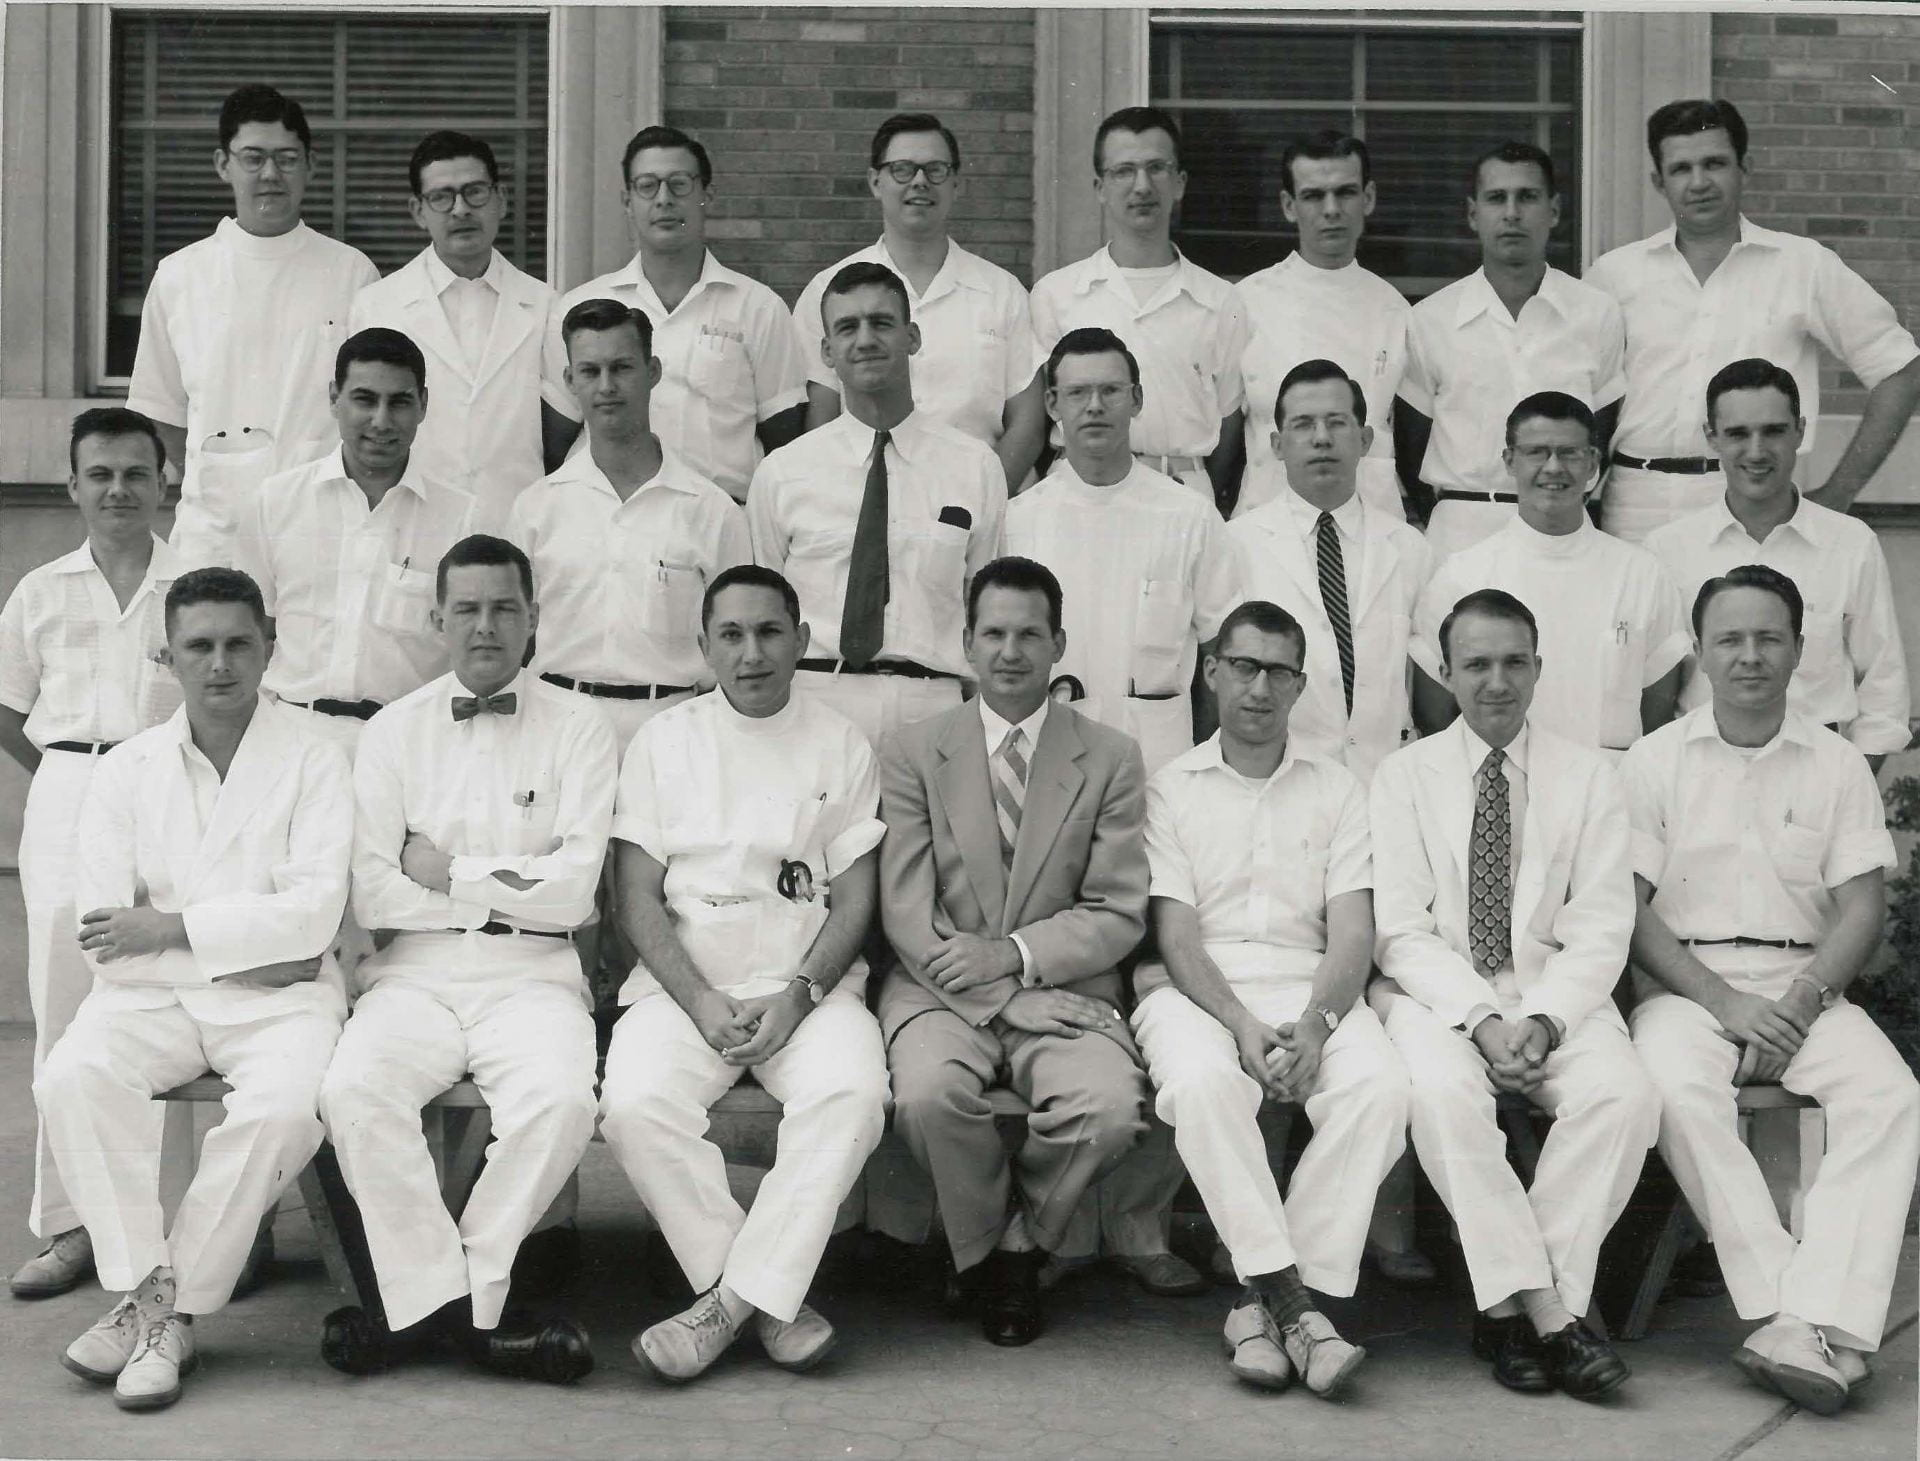 1954 Housestaff Photo (2)